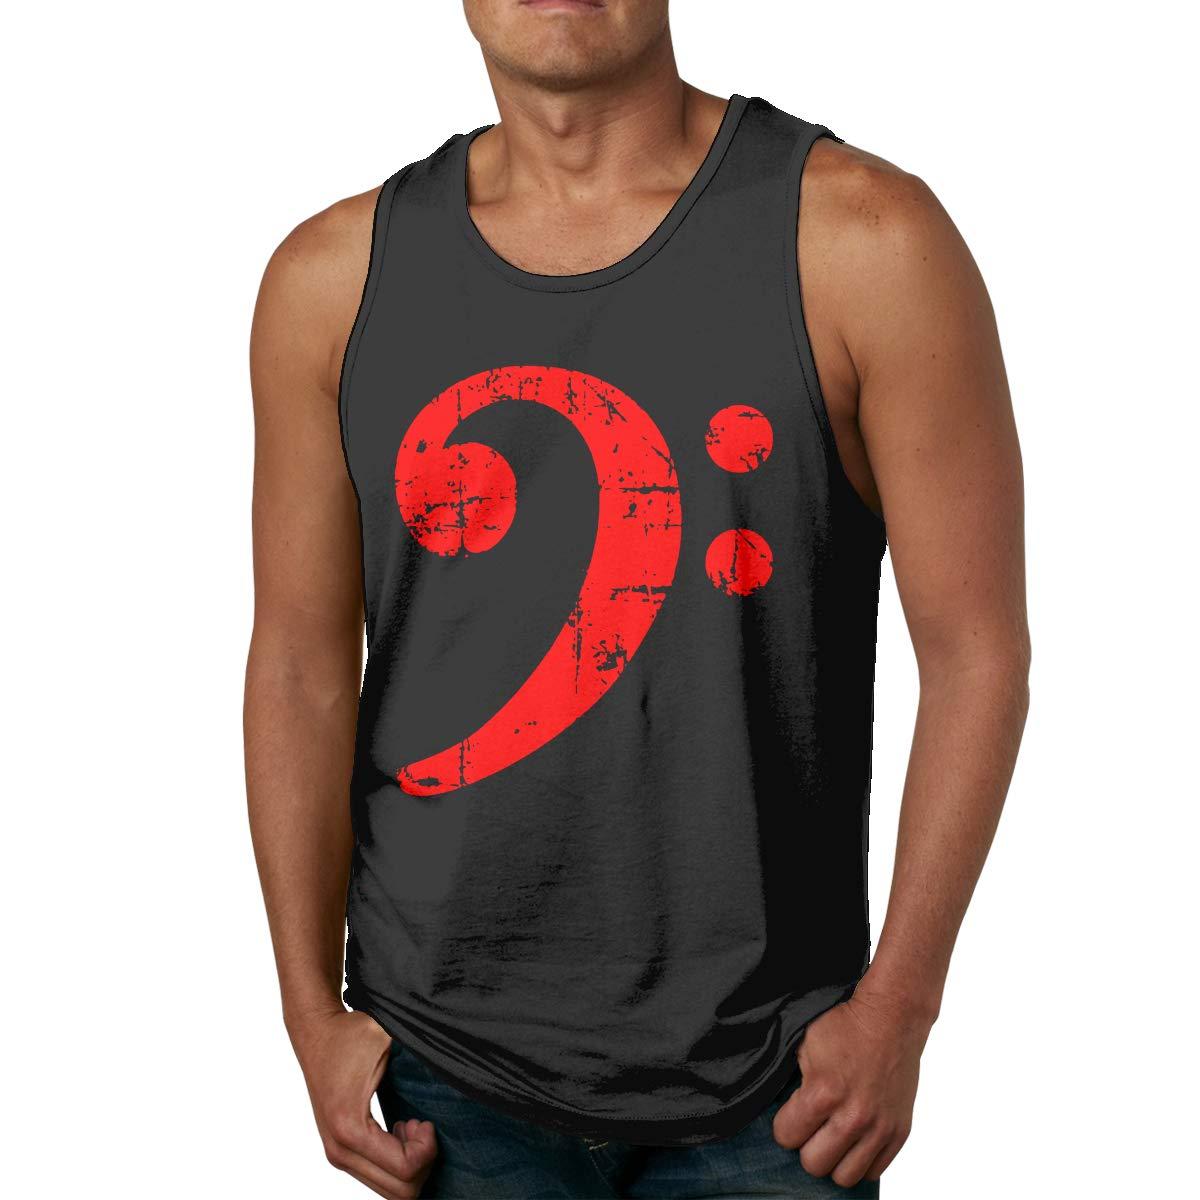 Retro Bass Clef Musical Symbol Men Printed Vest Sports Tank-Top T Shirt Leisure Tees Sleeveless Shirts